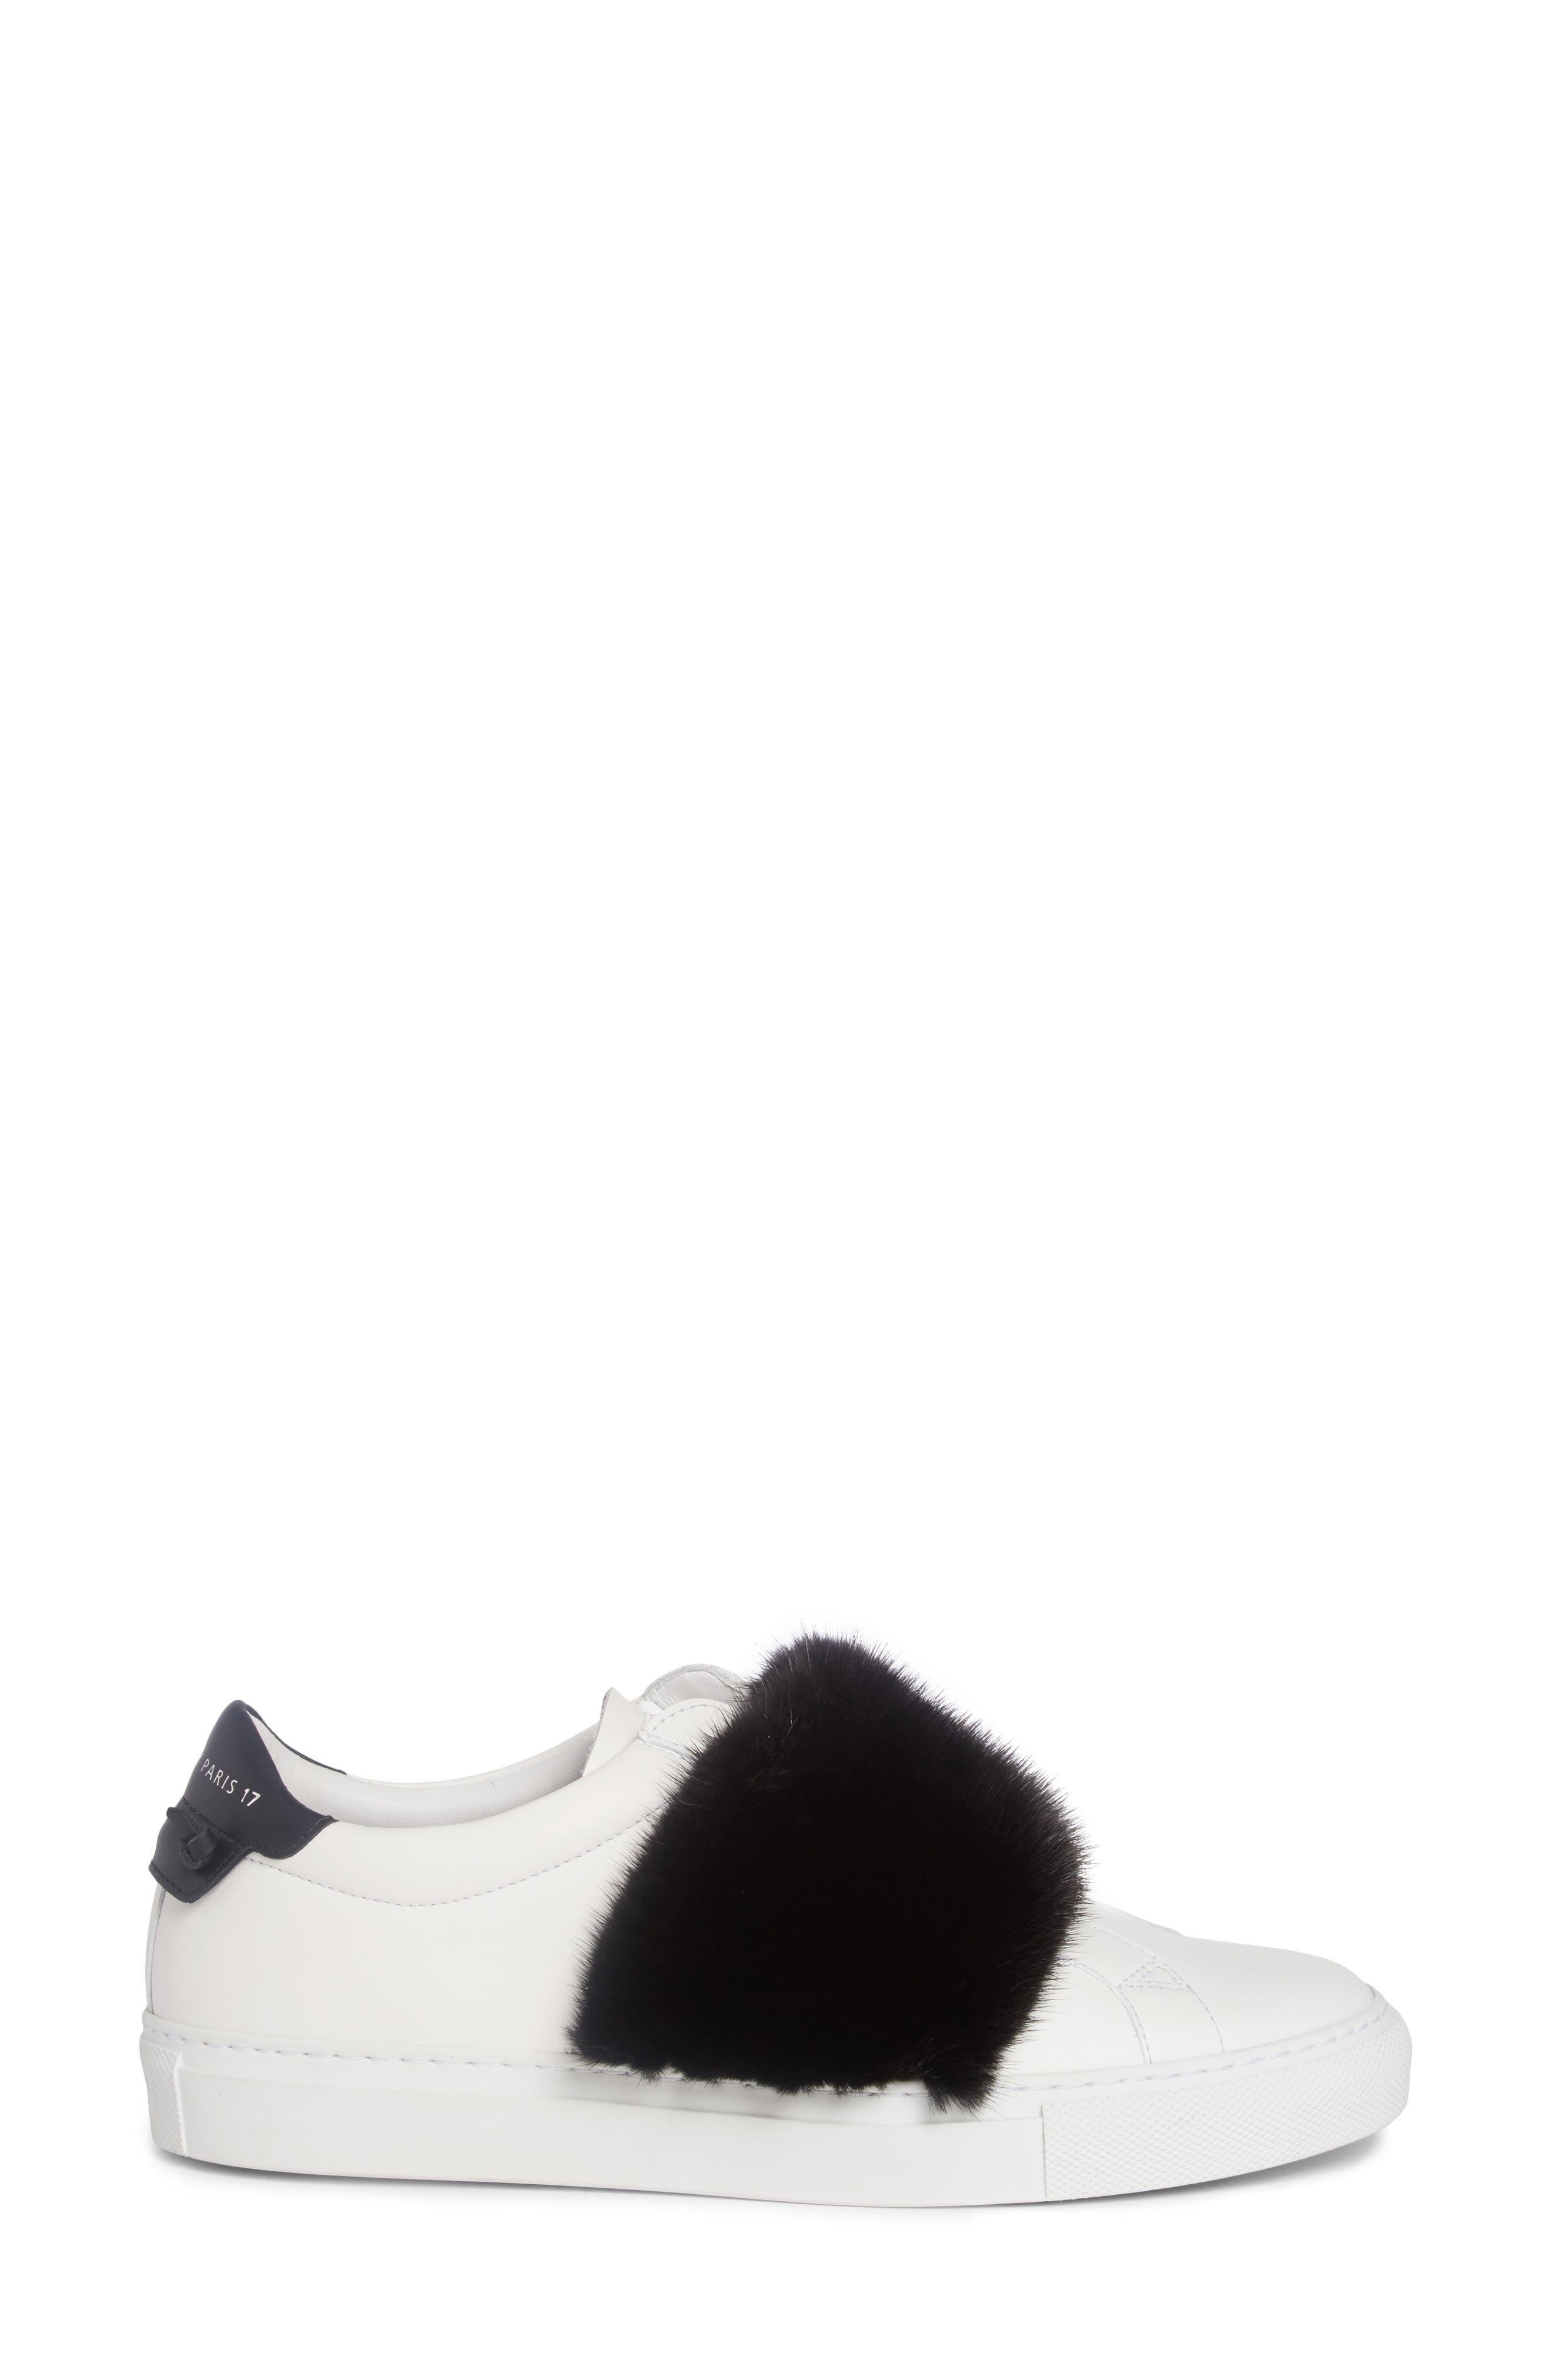 Urban Street Slip-On Sneaker with Genuine Mink Fur Trim,                             Alternate thumbnail 12, color,